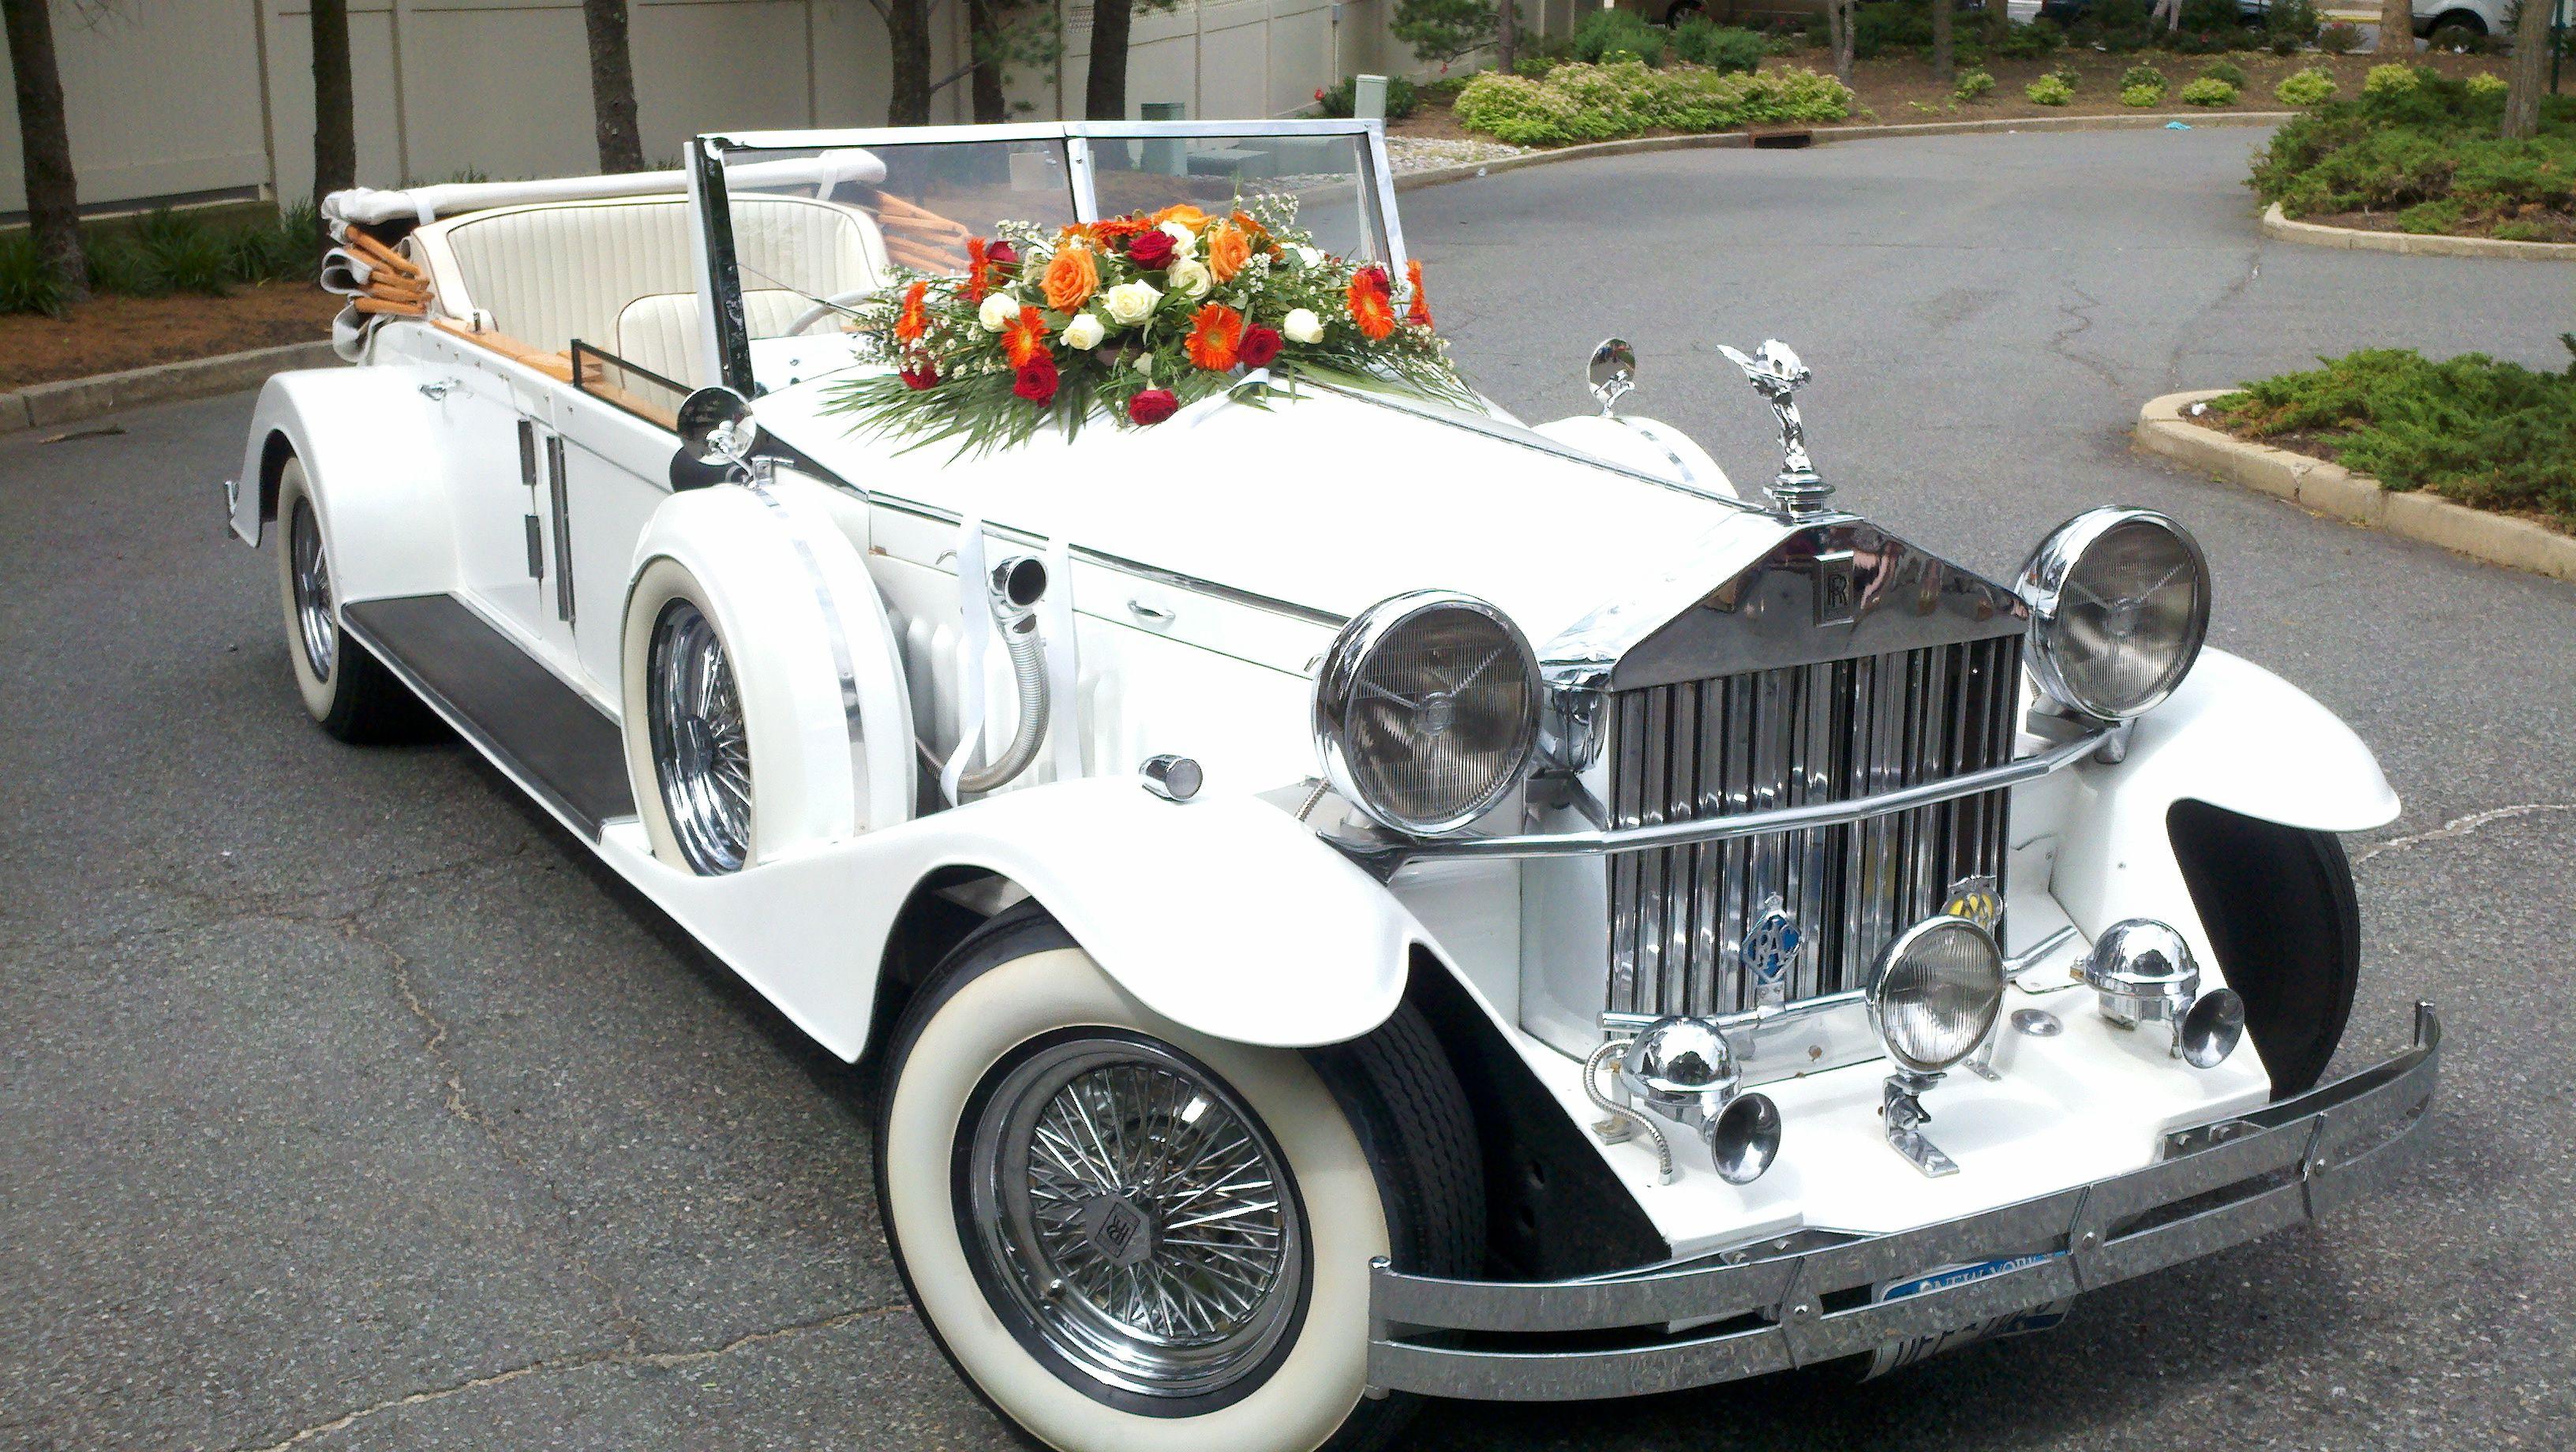 Vintage 1920 S Rolls Royce Phantom Limousine Perfect For Any Wedding Day Wedding Limousine Rolls Royce Limousine Rolls Royce Rolls Royce Phantom